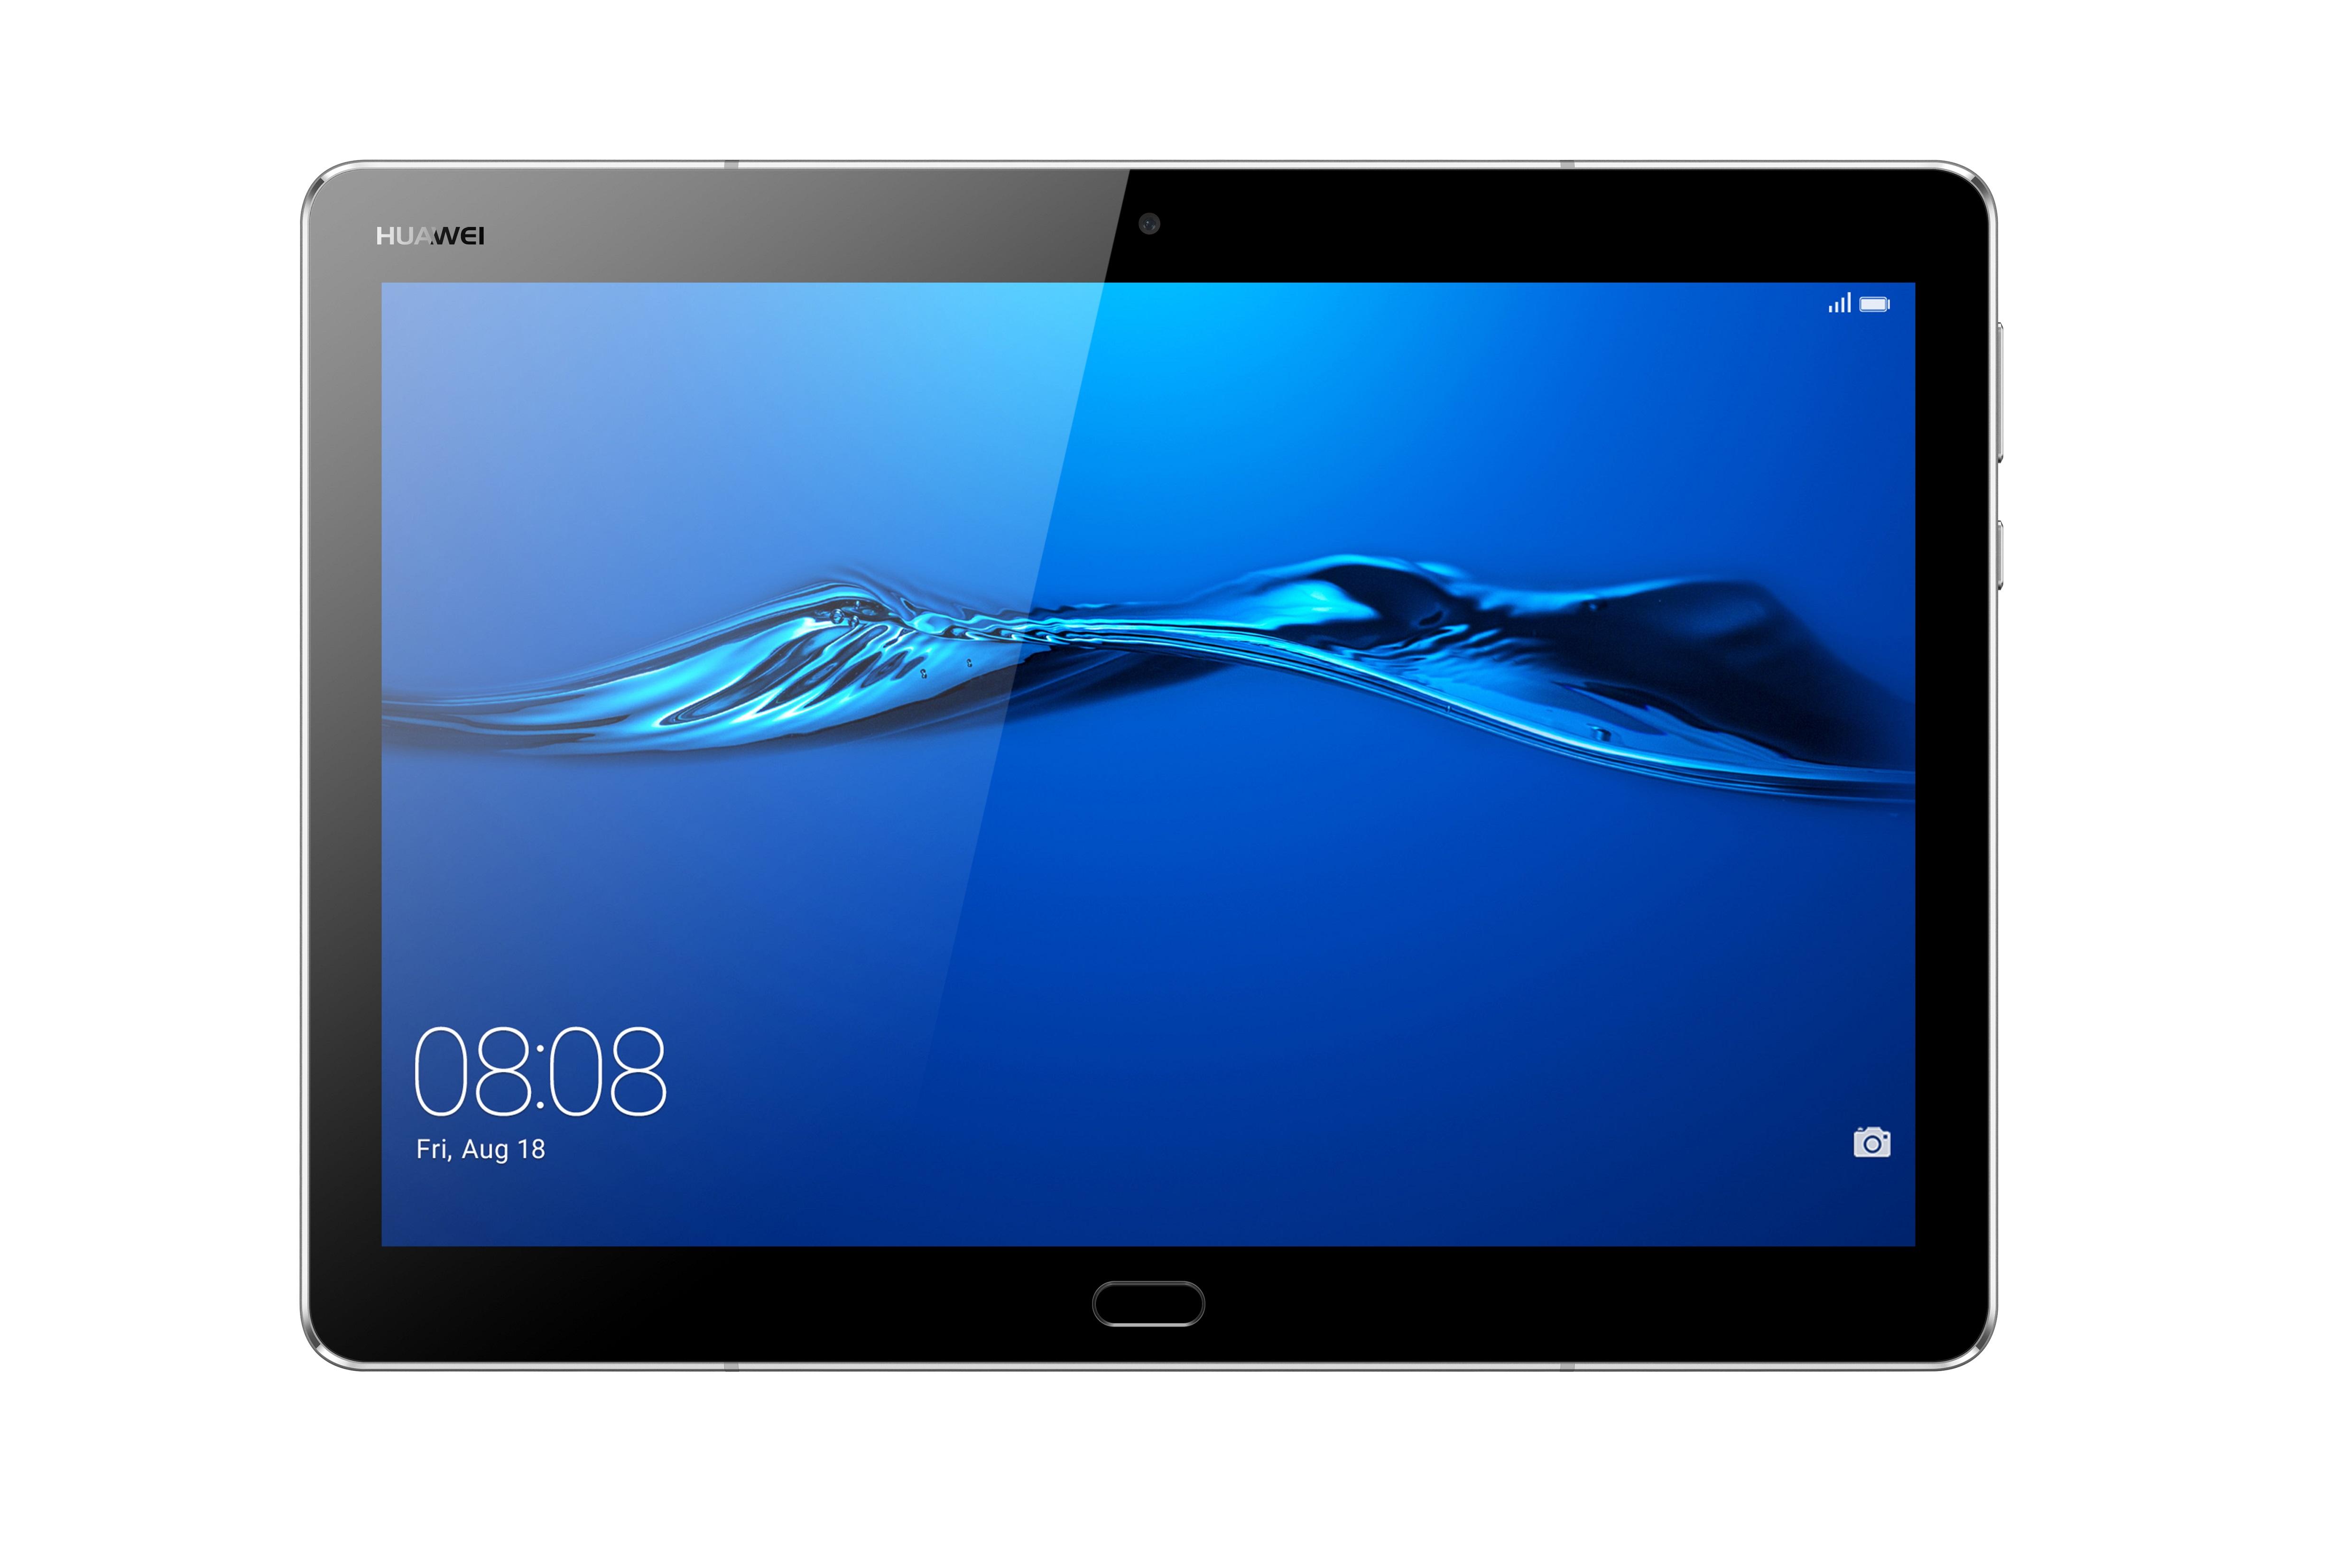 Huawei MediaPad M3 lite 10.0 32GB Wi-Fi Gray